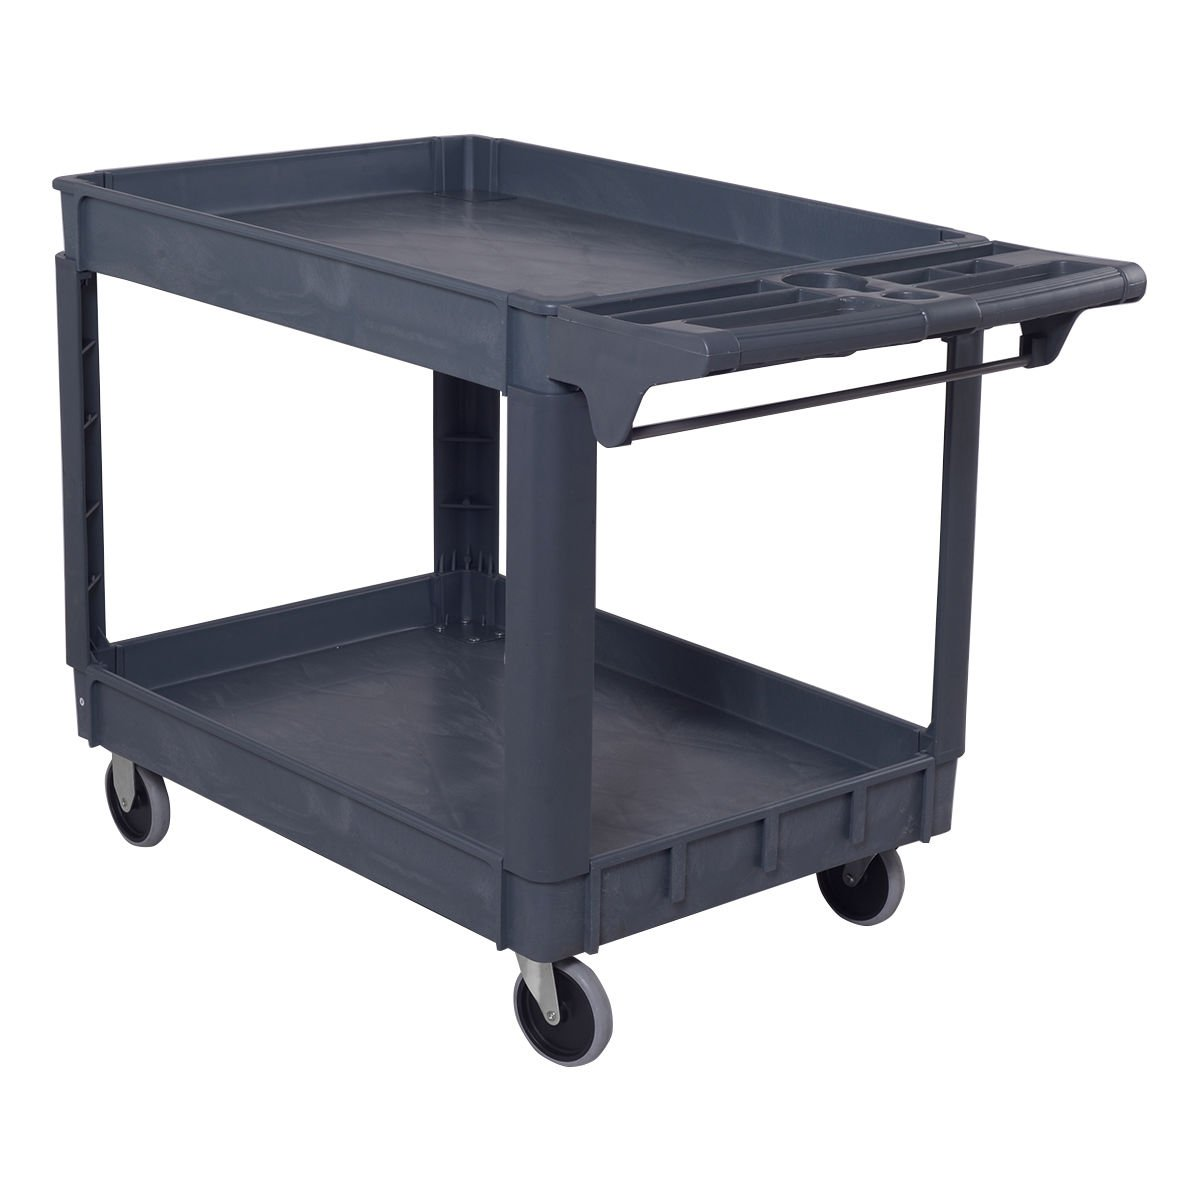 Goplus Plastic Service Cart Utility Storage Cart for All Purpose 550 LBS Capacity (2 Shelves 46'' x 25'' x 33'')